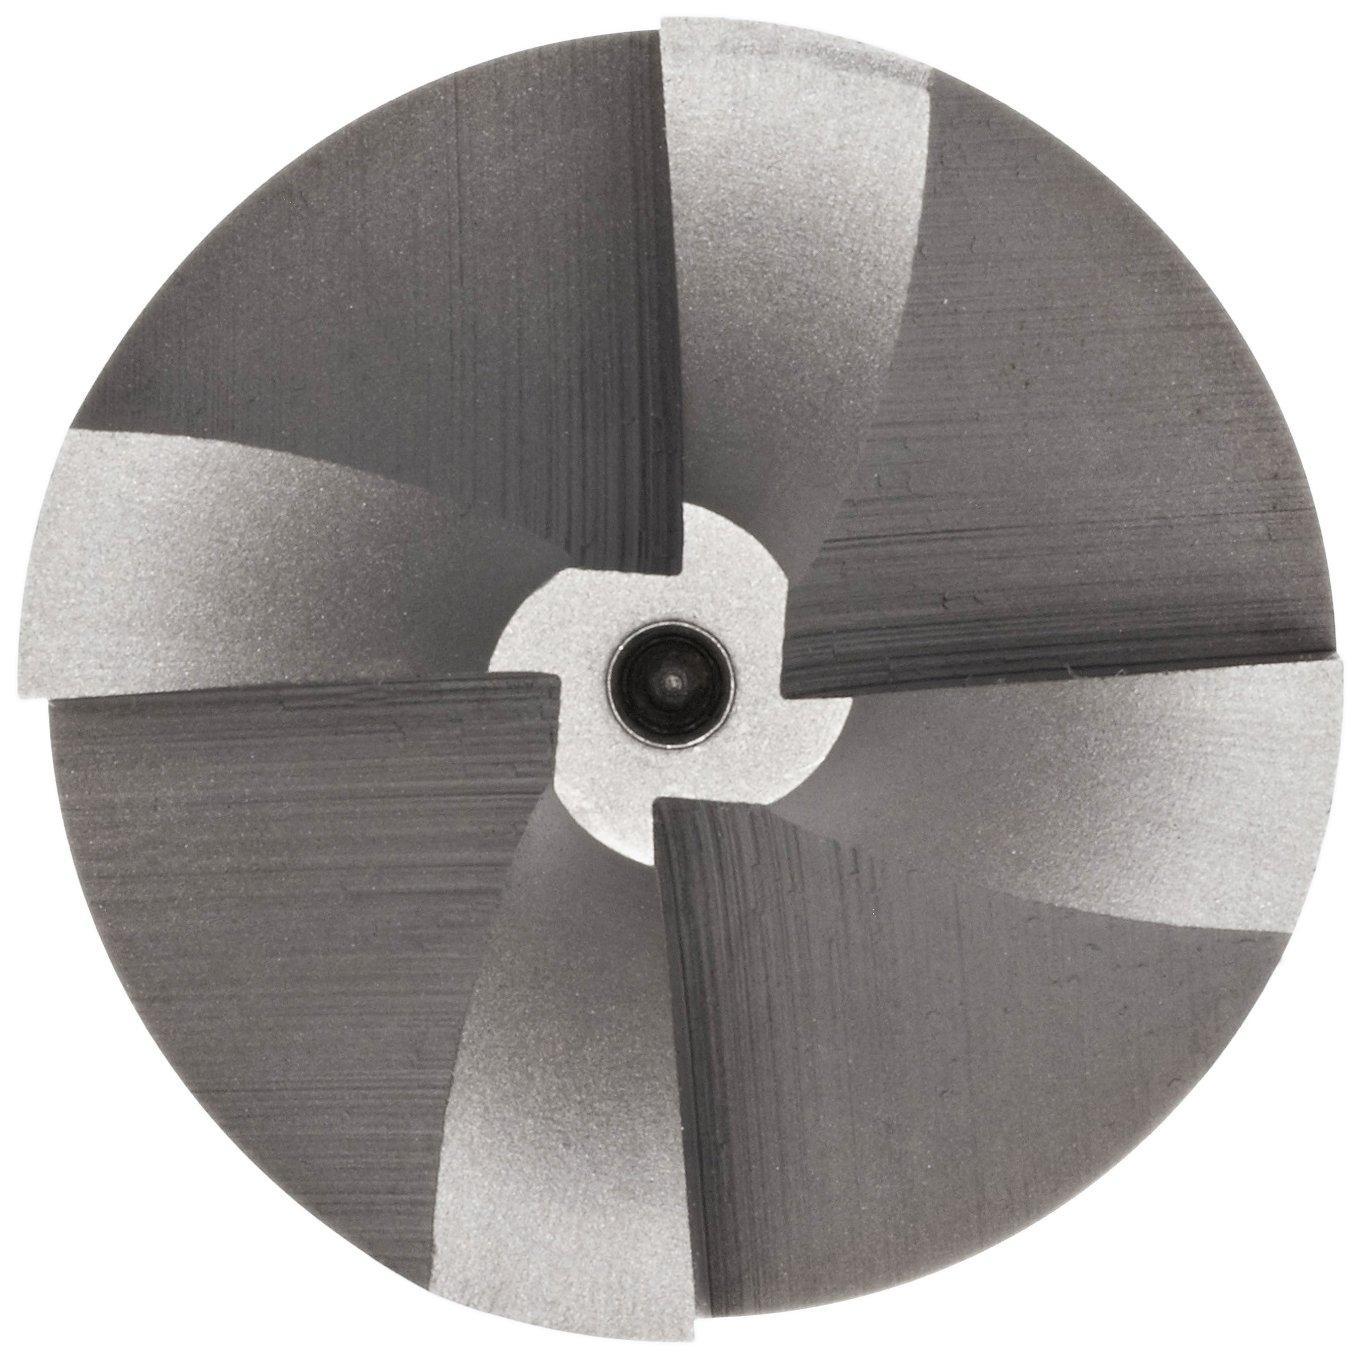 Uncoated YG-1 E2237 Cobalt Steel Corner Rounding End Mill 1 Shank Diameter 4 Flutes Non-Center Cutting 4.25 Overall Length Bright Finish 1.9375 Cutting Diameter Weldon Shank